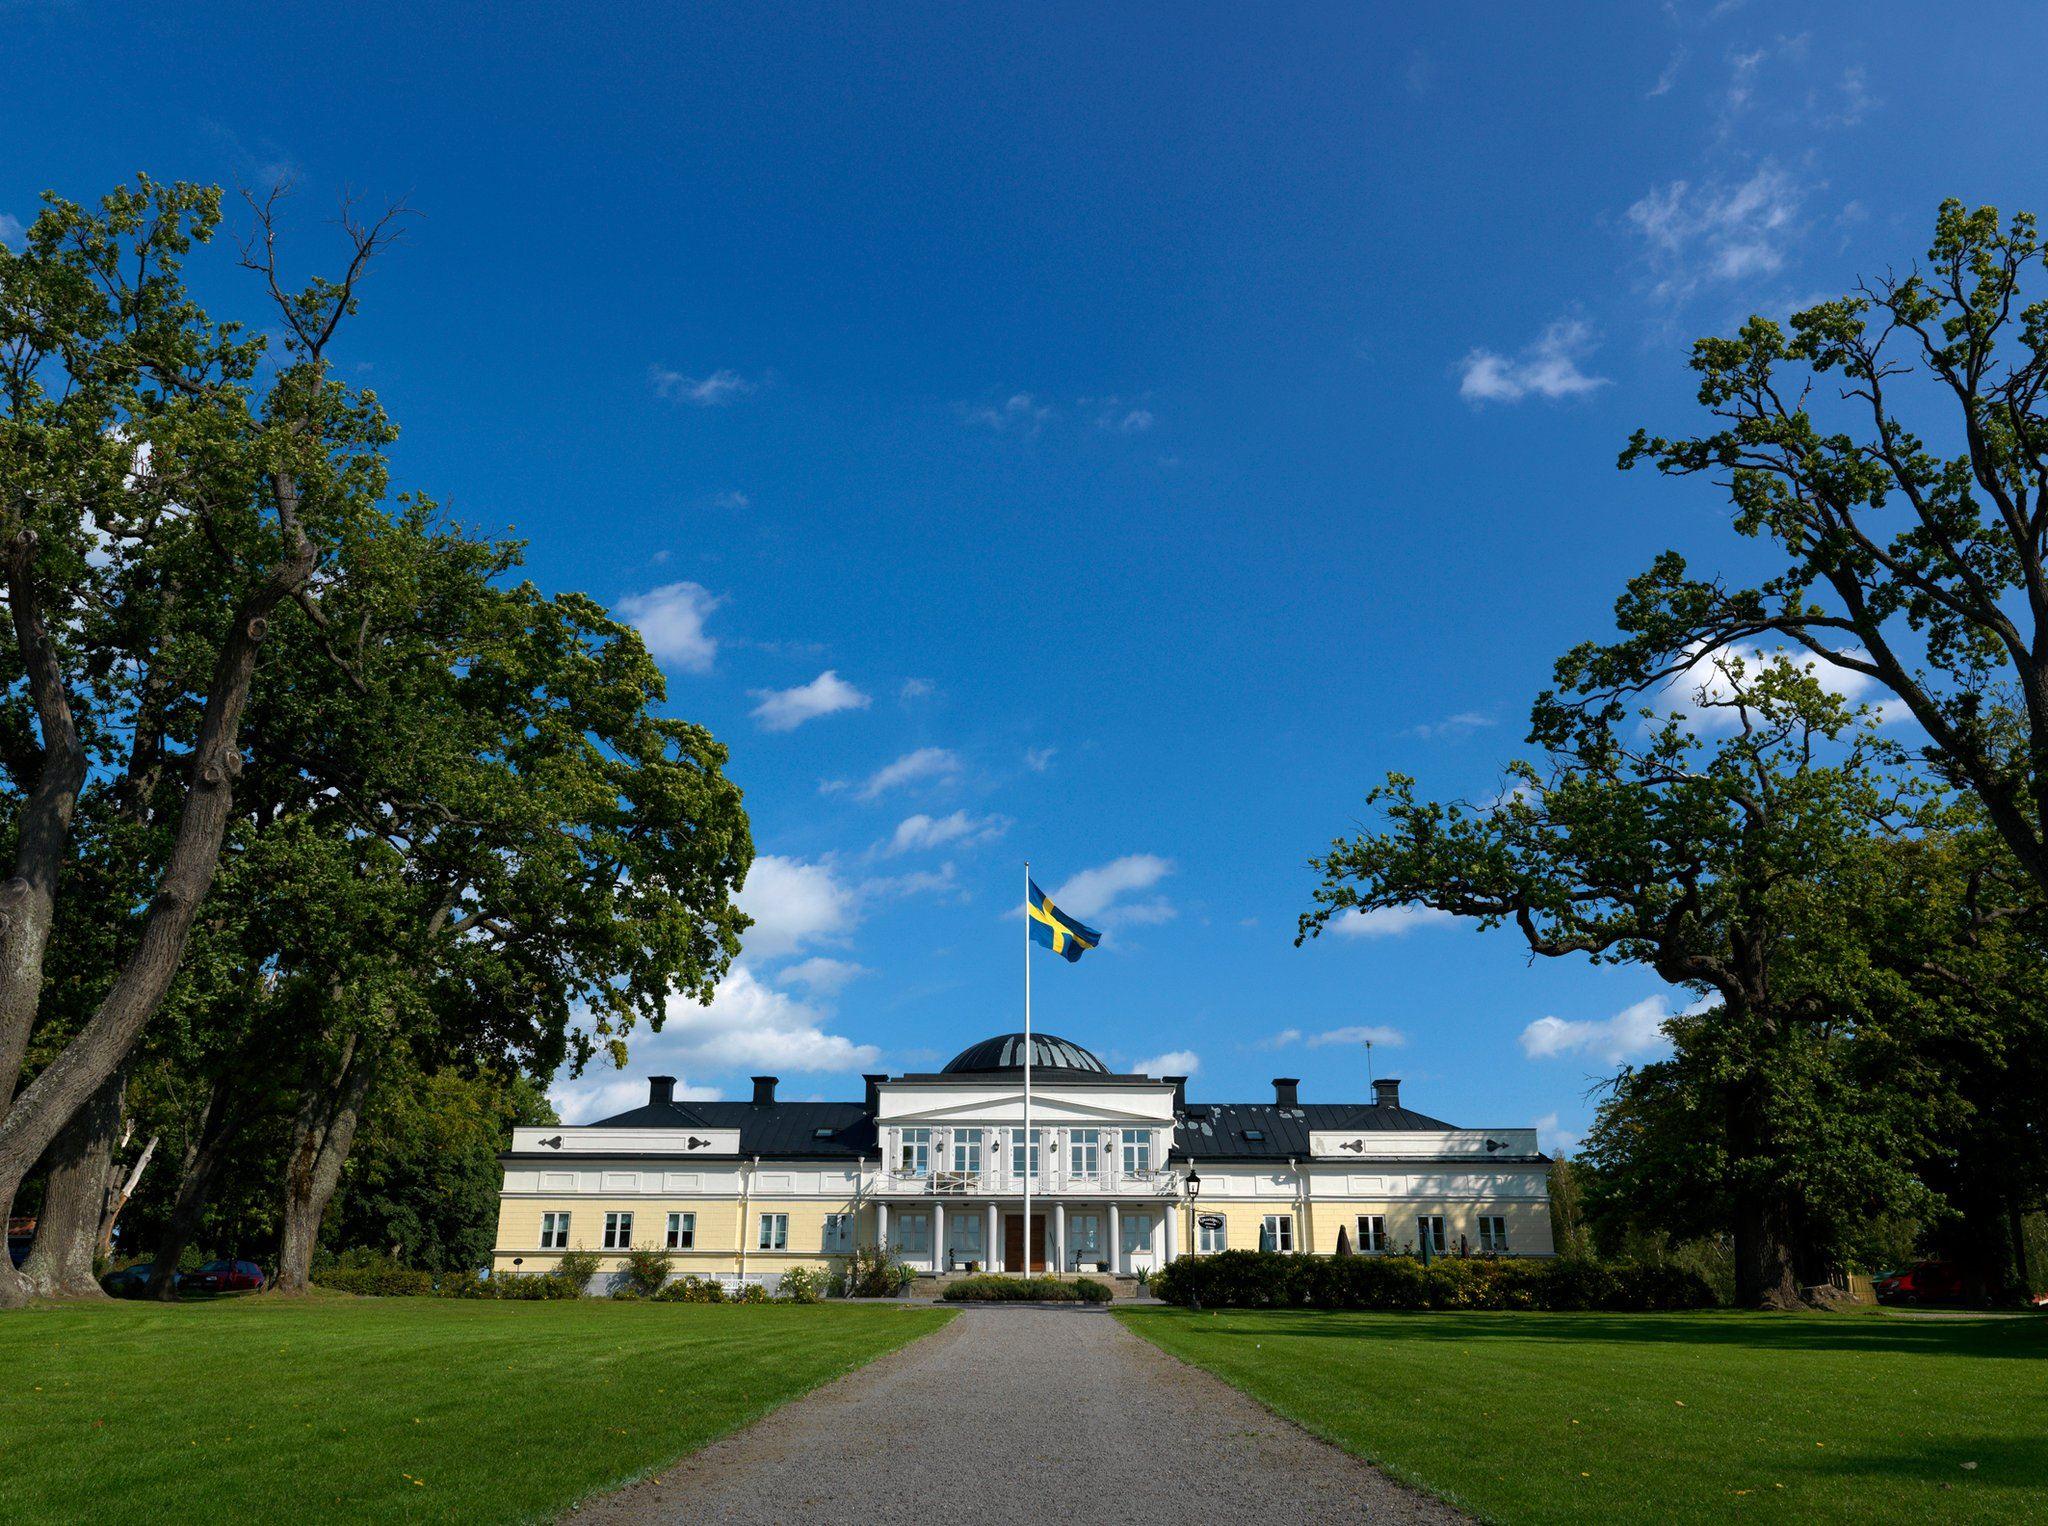 Parkkonsert med Gunnebo Musikkår på Gränsö Slott